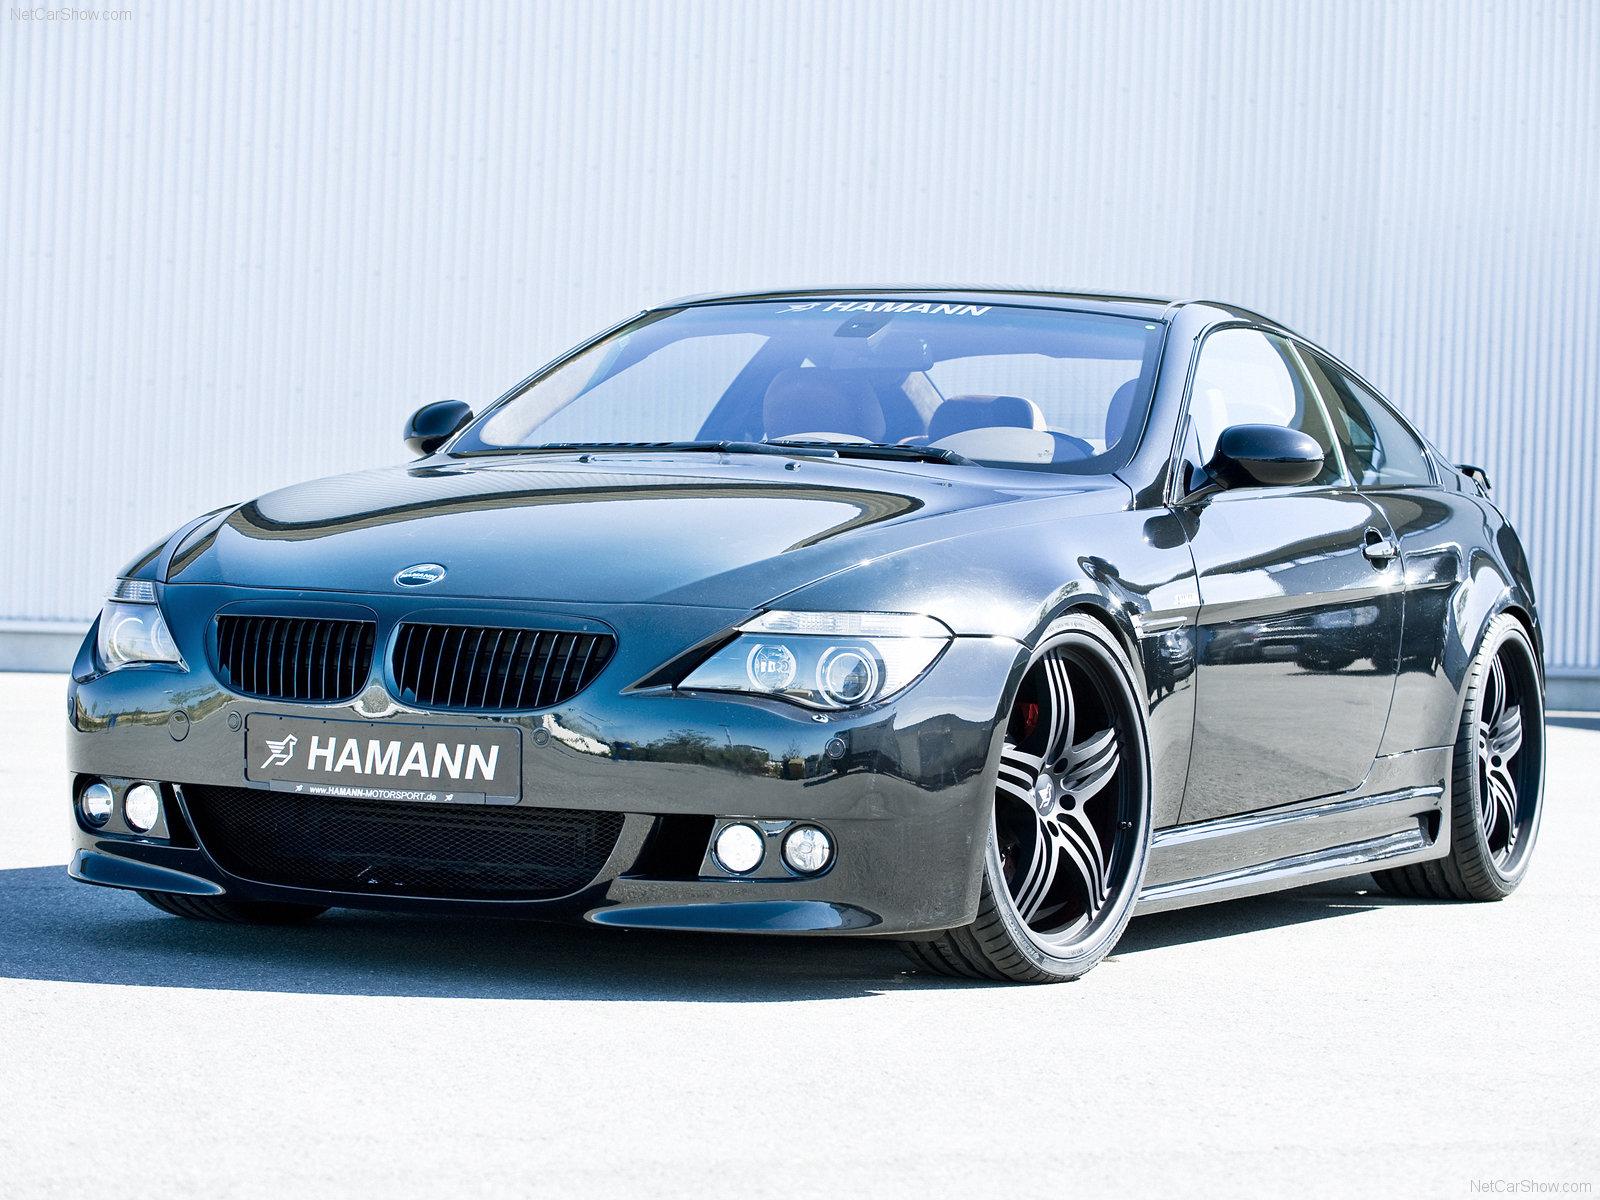 hamann bmw 6 series picture #56697 | hamann photo gallery | carsbase